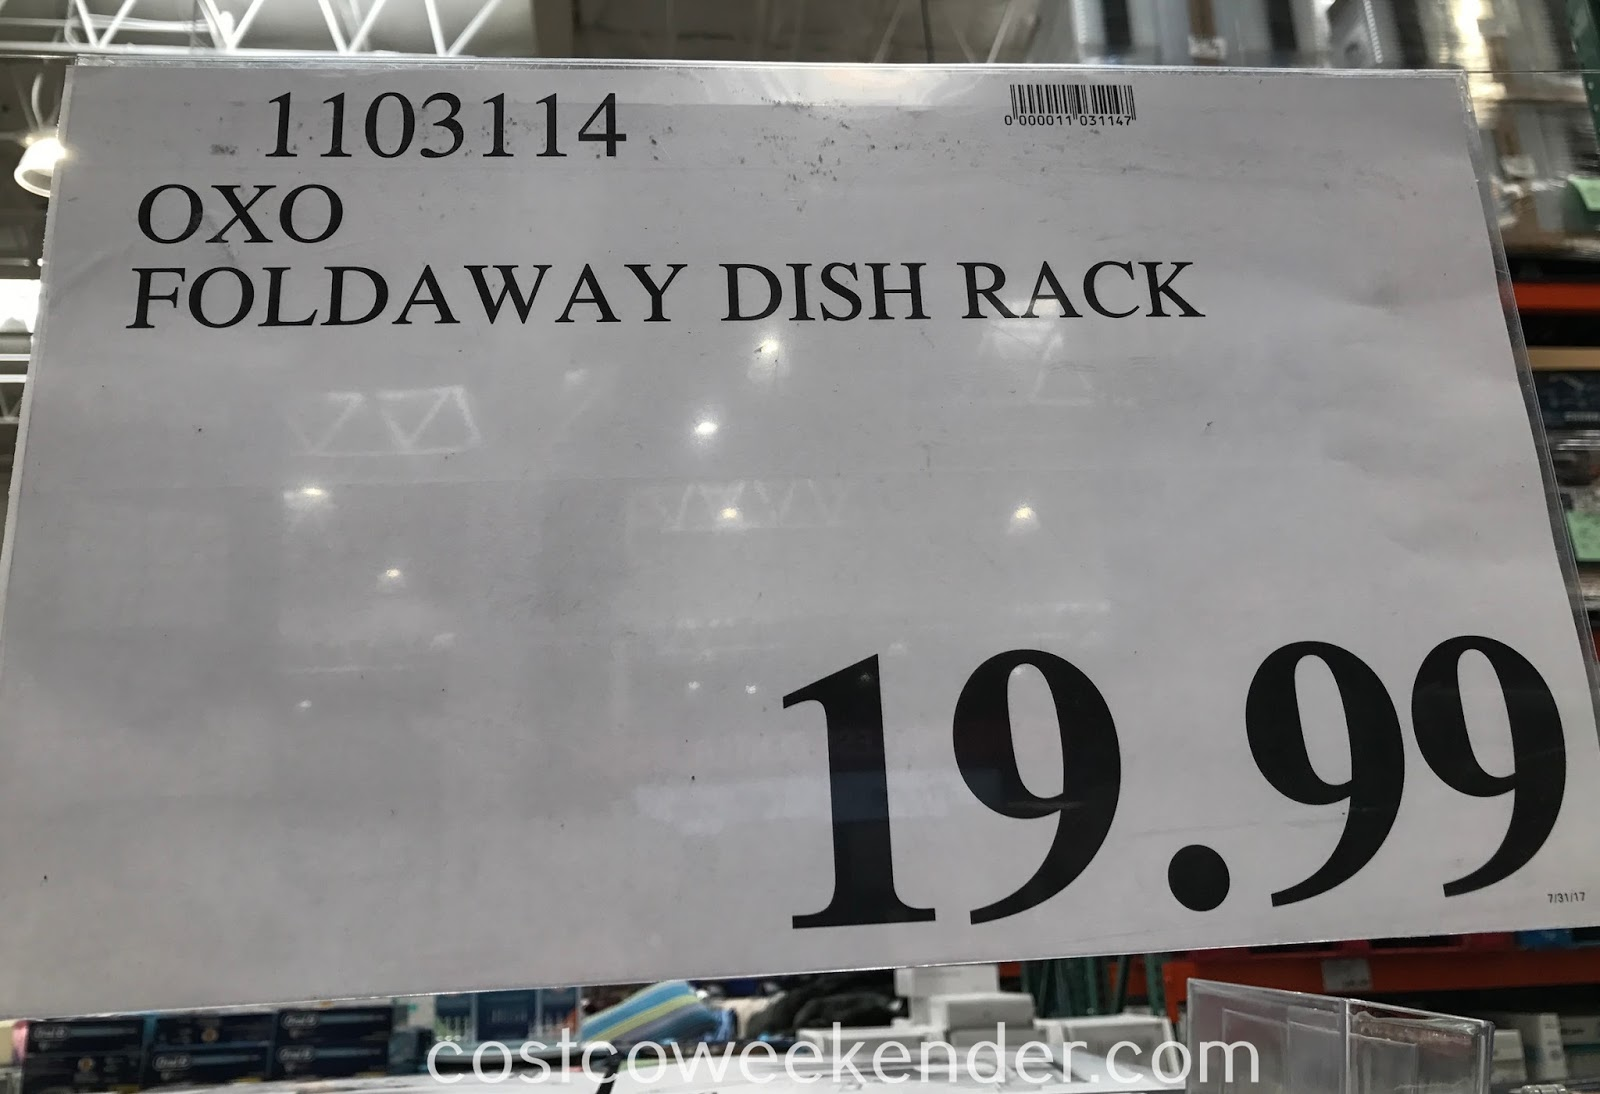 Oxo Softworks Foldaway Dishrack Costco Weekender